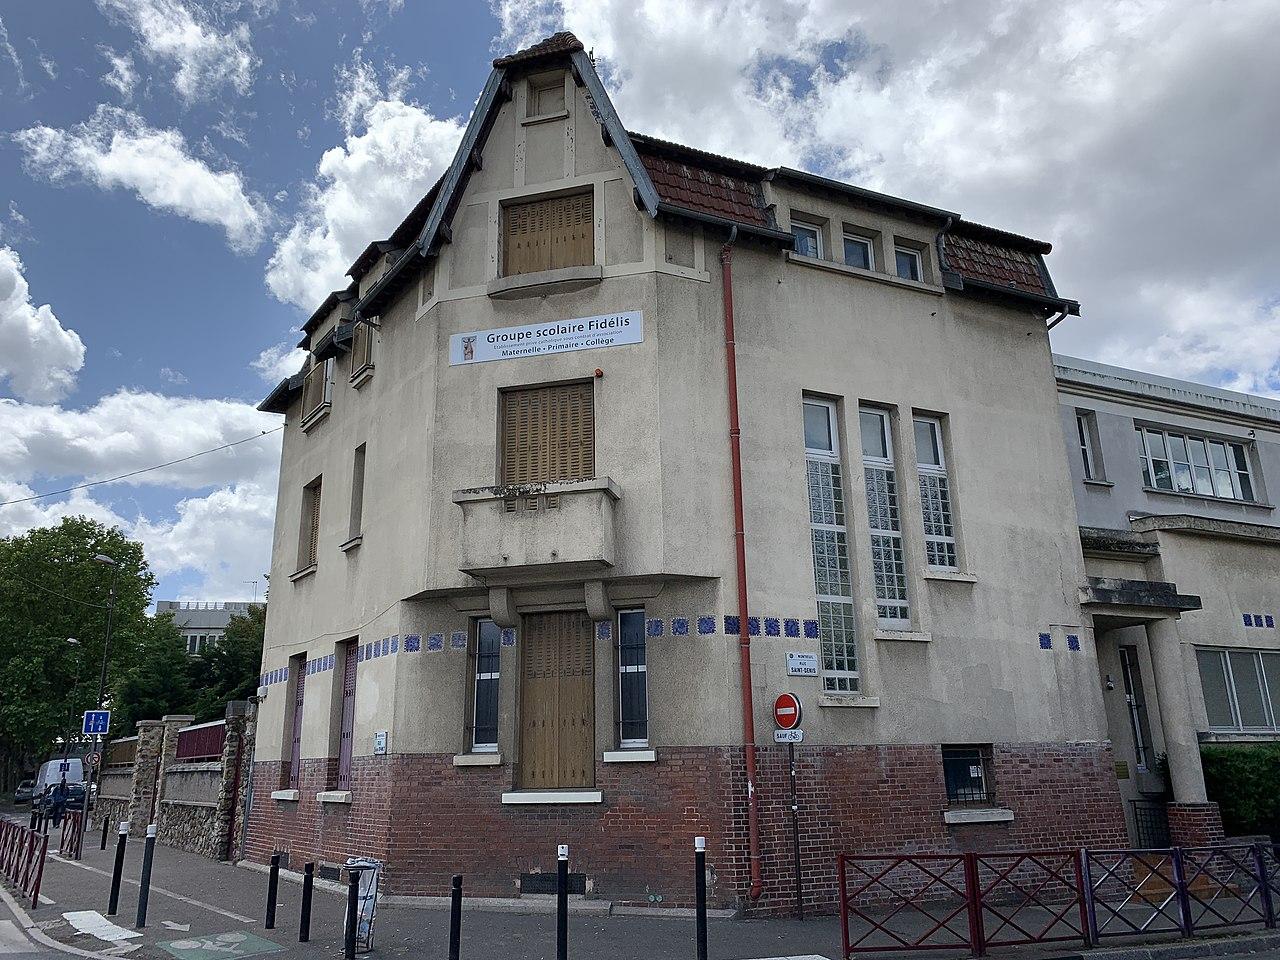 File:Groupe scolaire Virgo Fidelis Montreuil Seine St Denis 1.jpg -  Wikimedia Commons